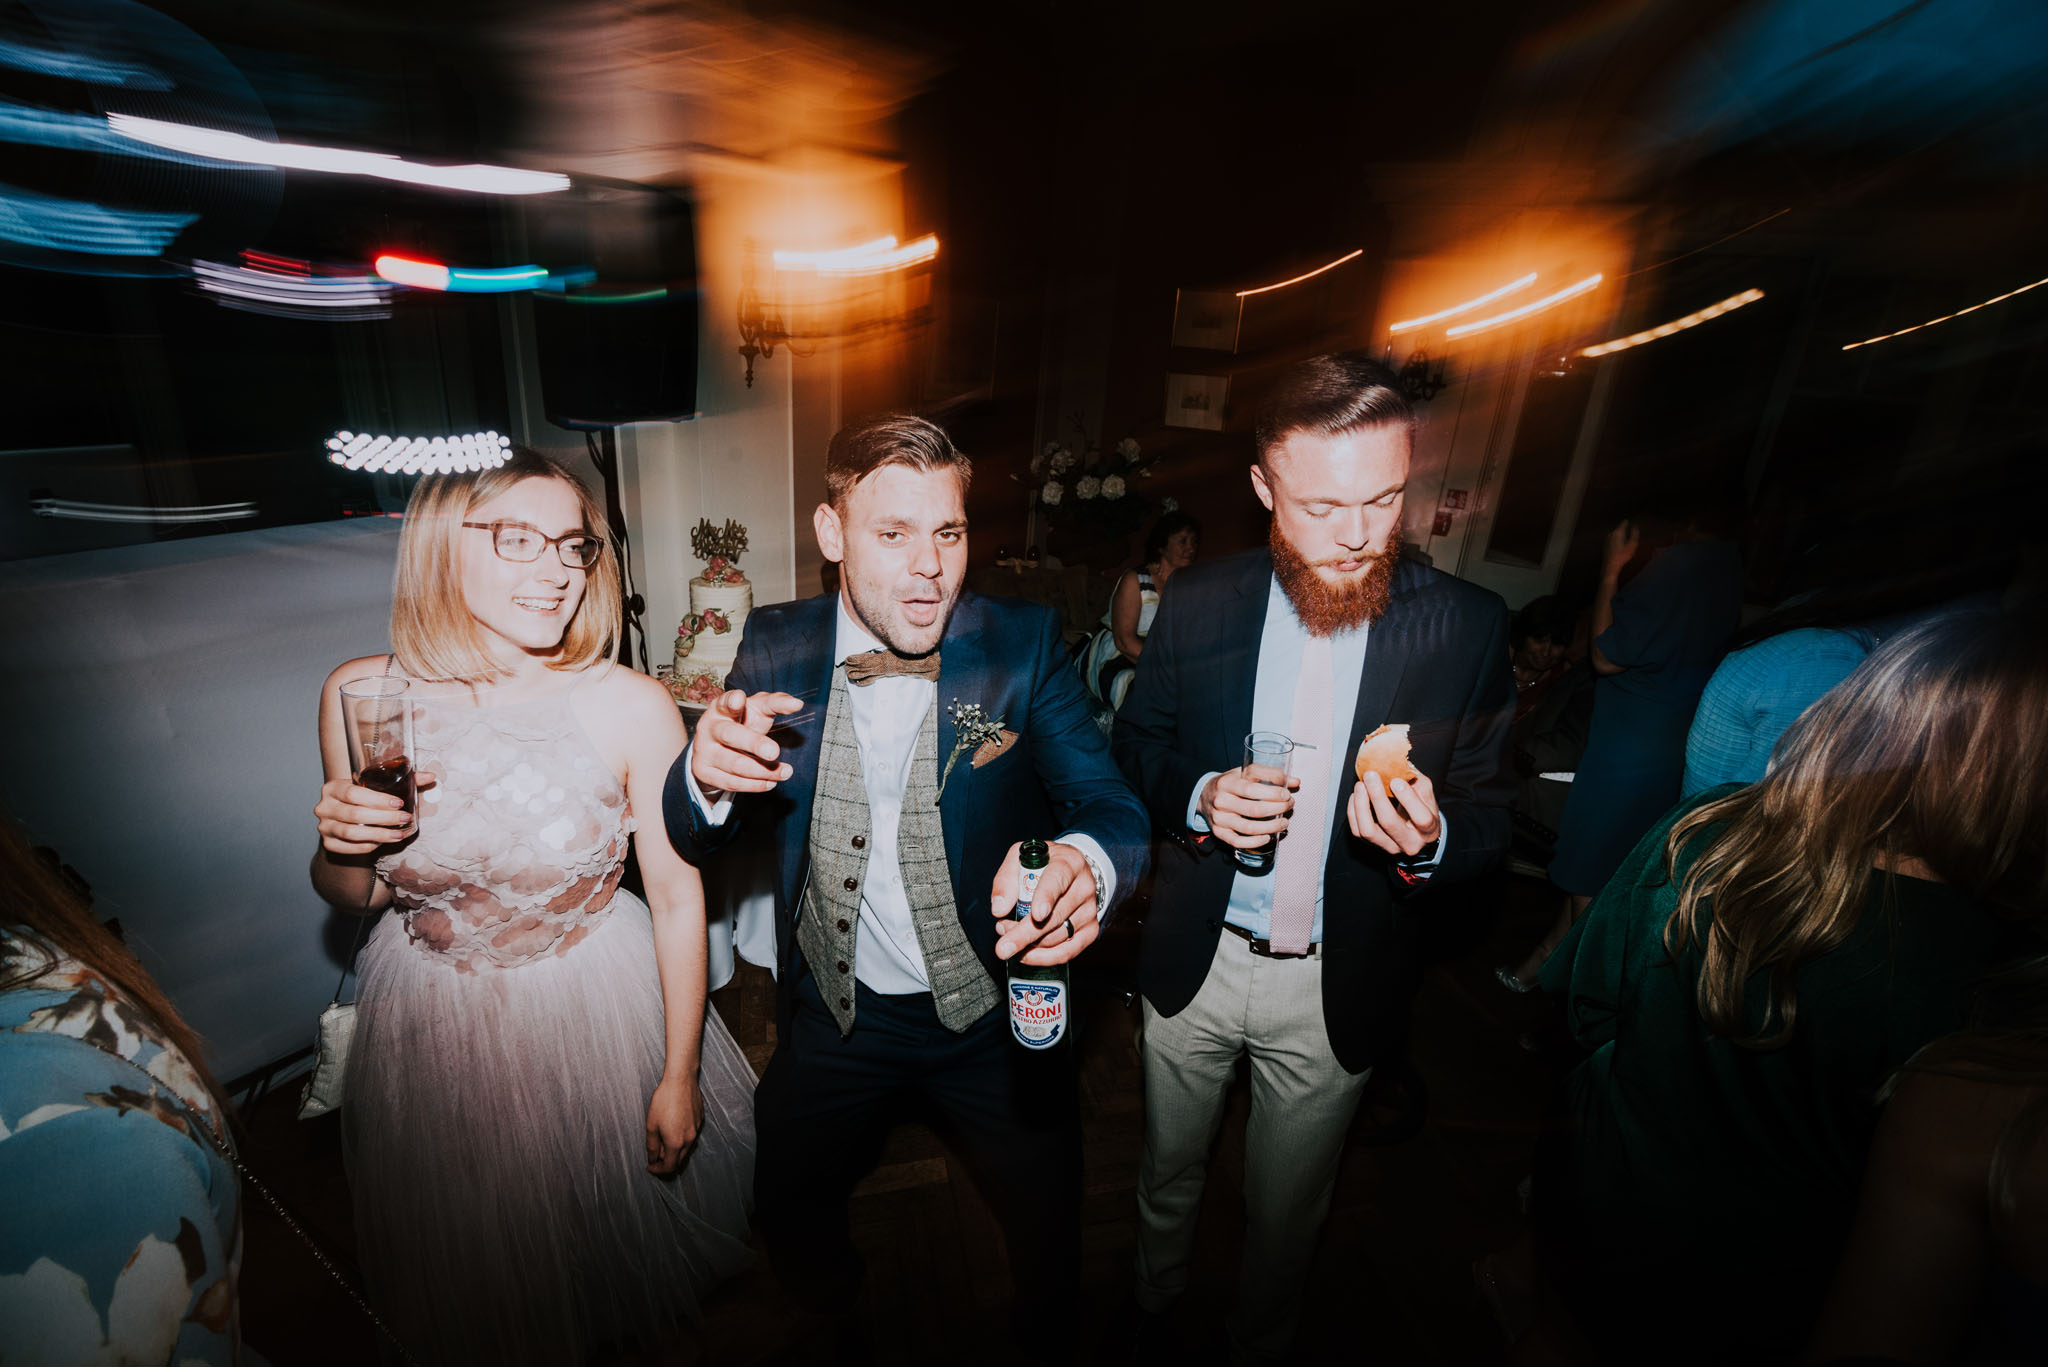 wedding-photographer-glewstone-court-hereford-scott-stockwell-photography489.jpg